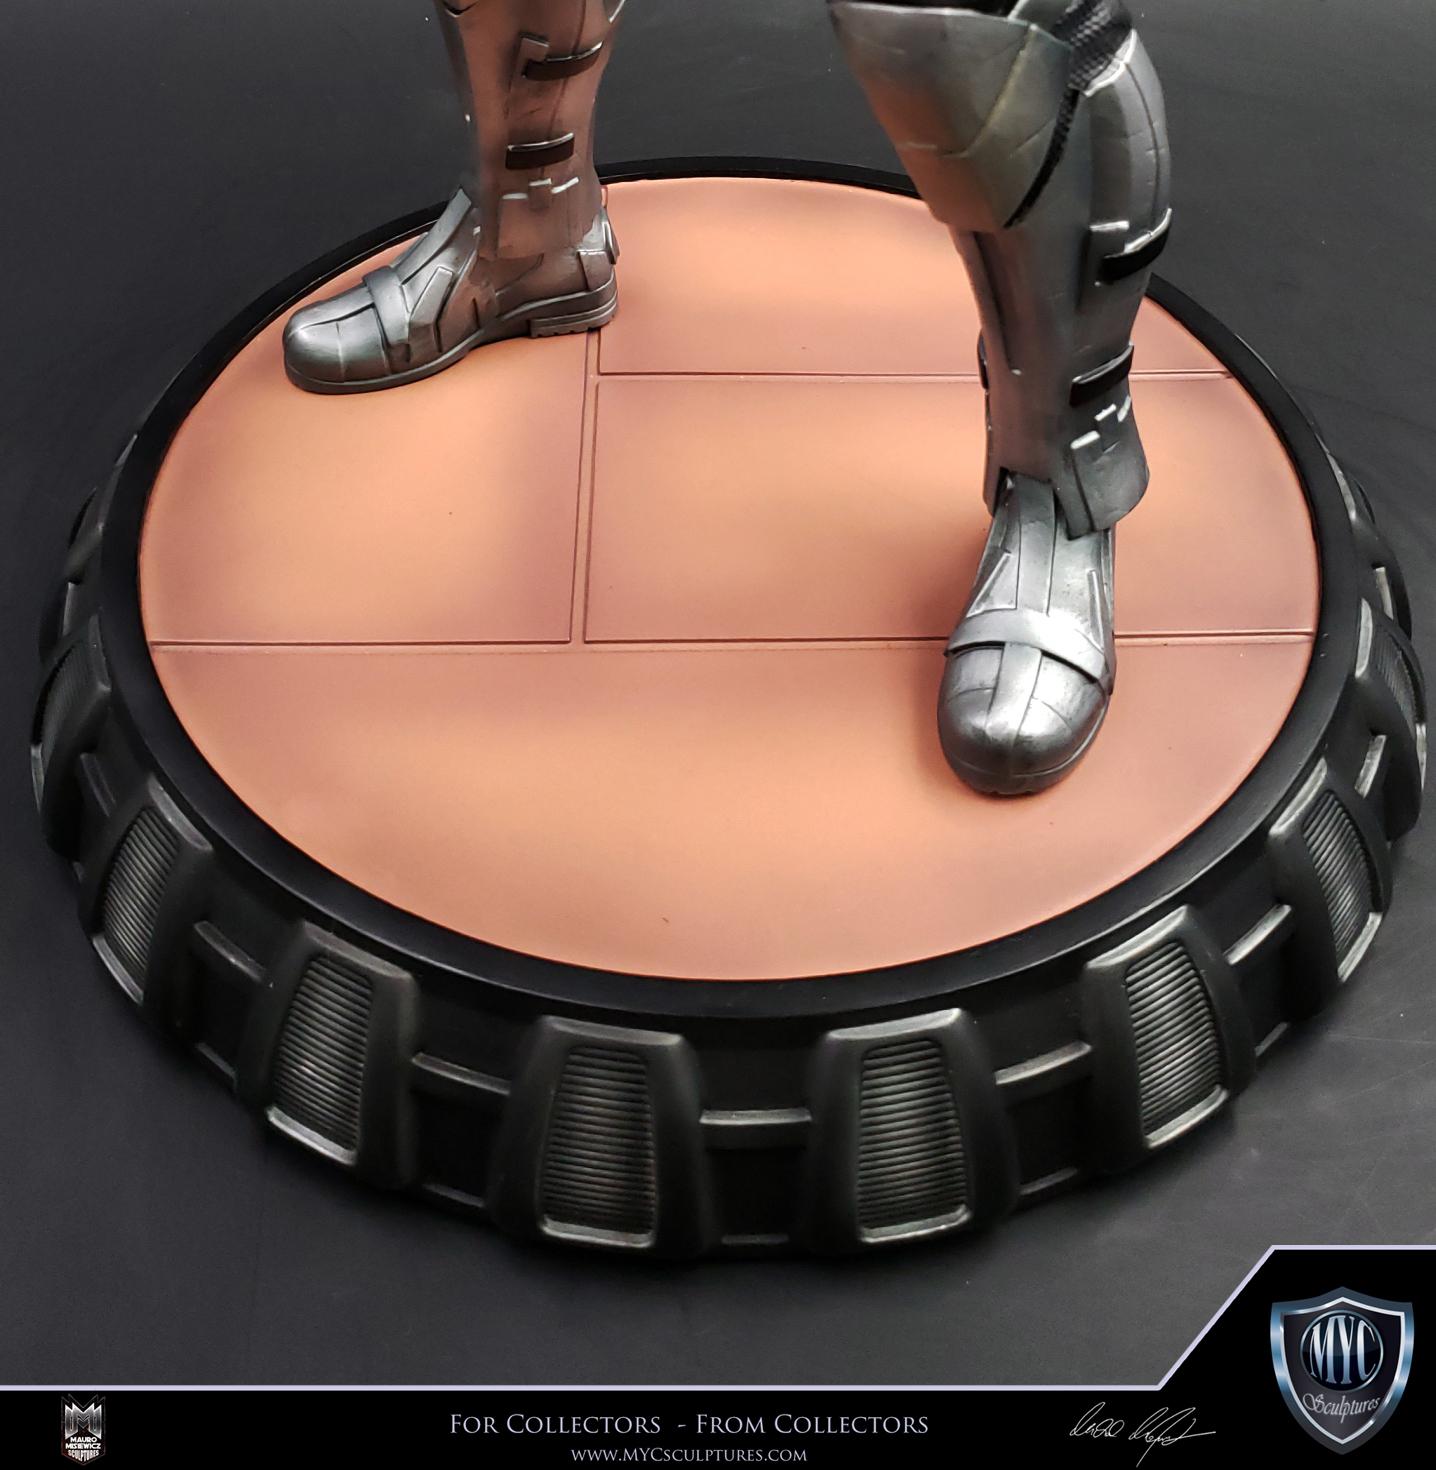 Sith_Acolyte_MYC_Sculptures_Statue_15